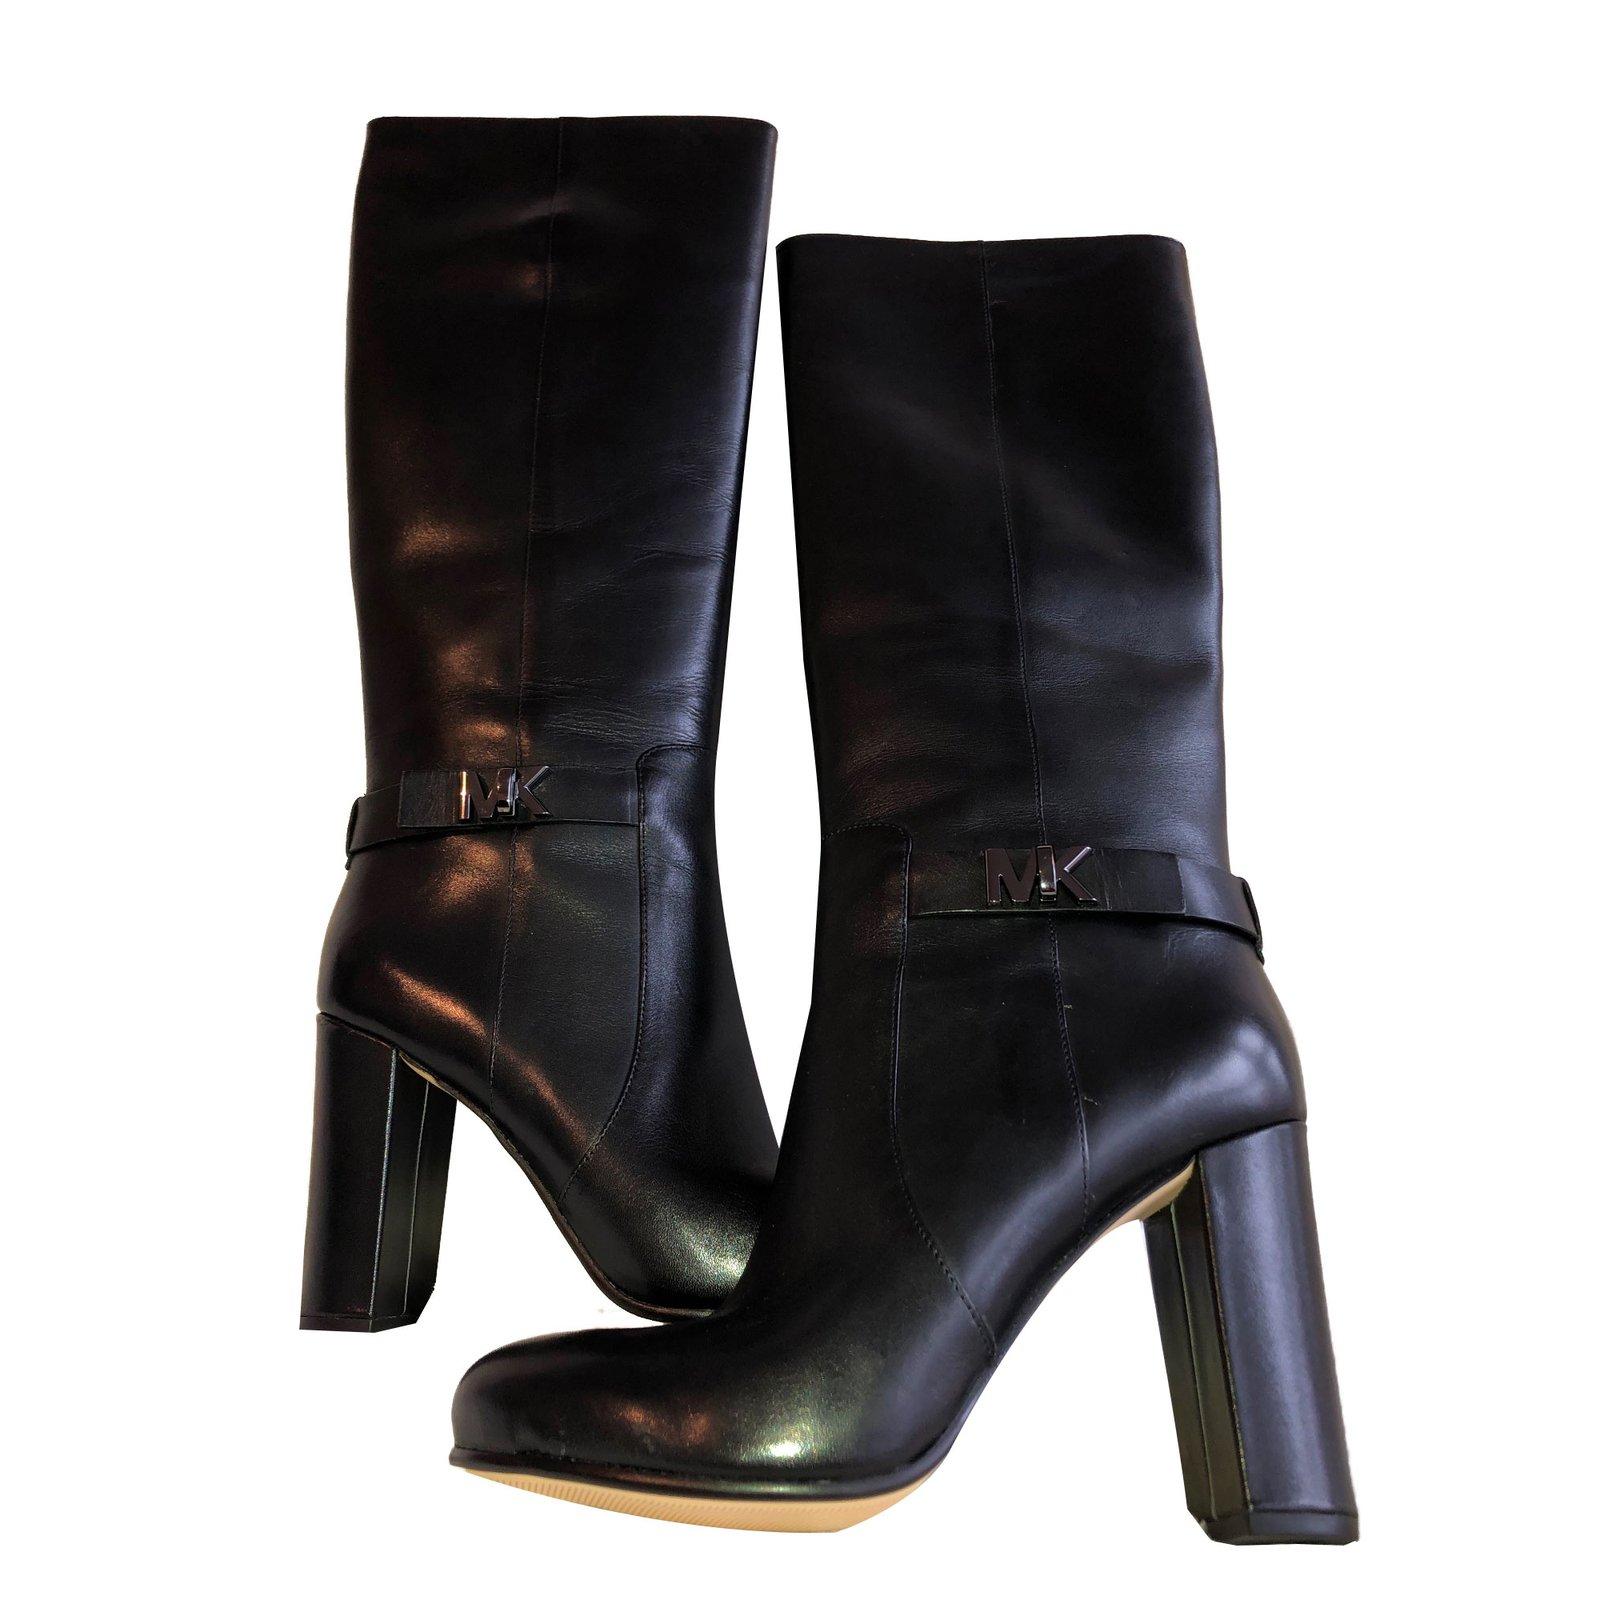 Michael Kors Booots Boots Patent